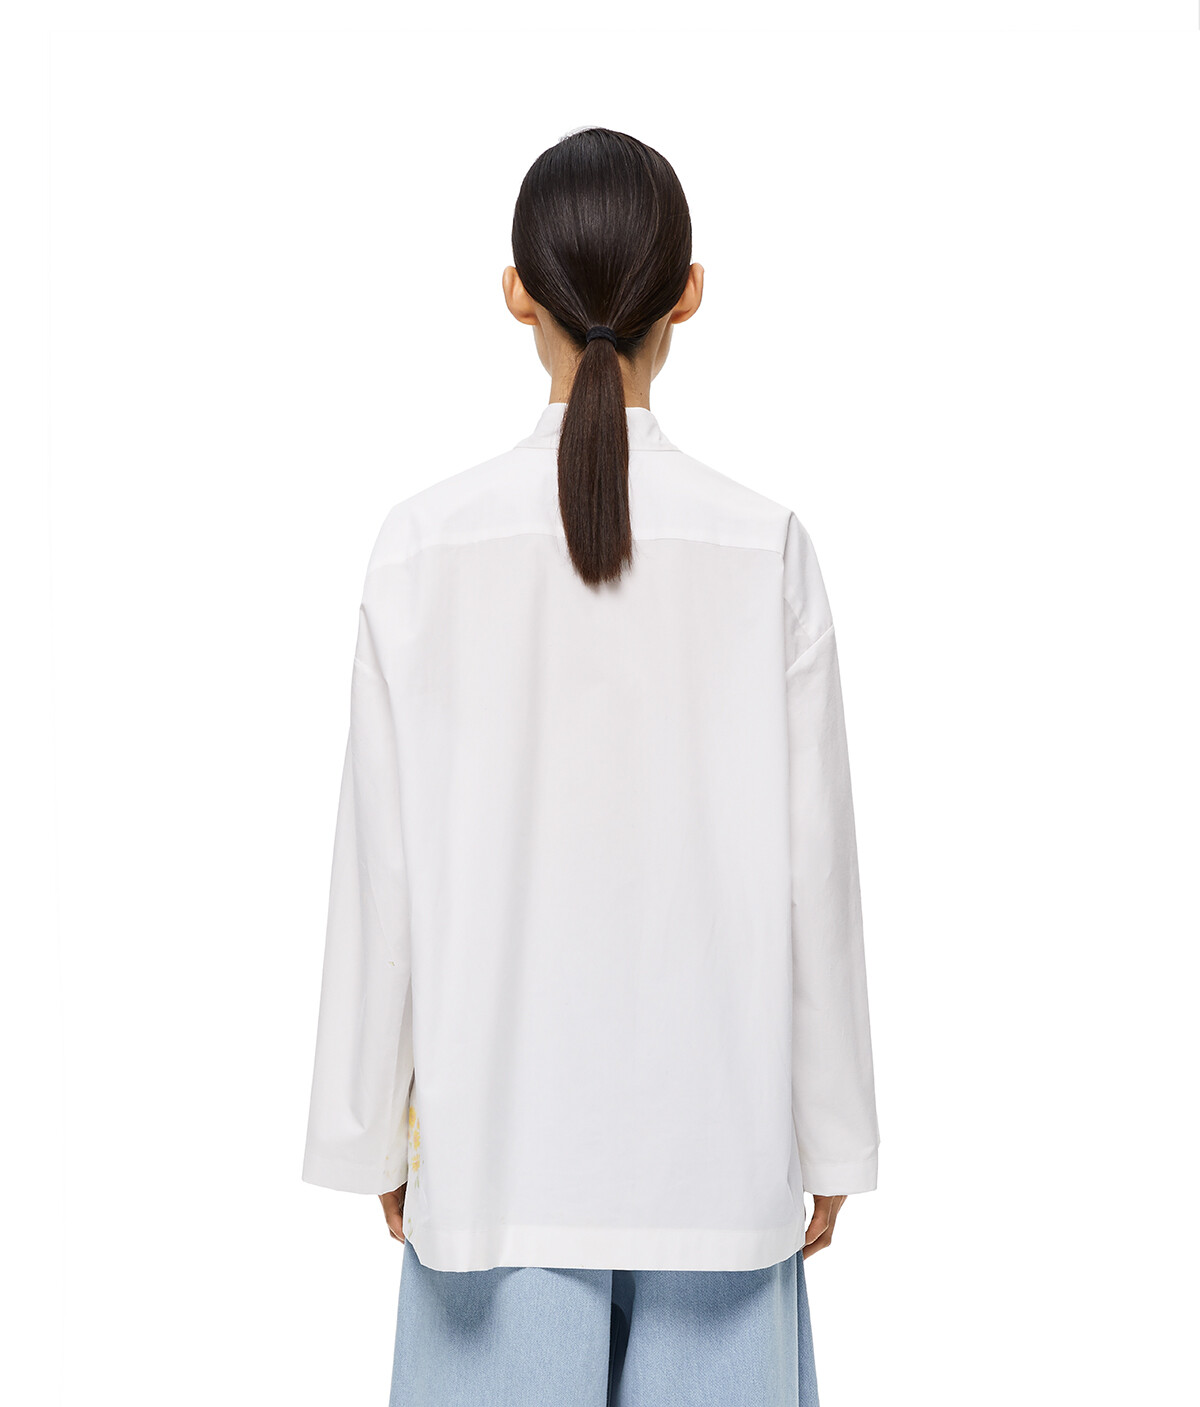 LOEWE Flower Print Asym Ov Shirt Blanco front